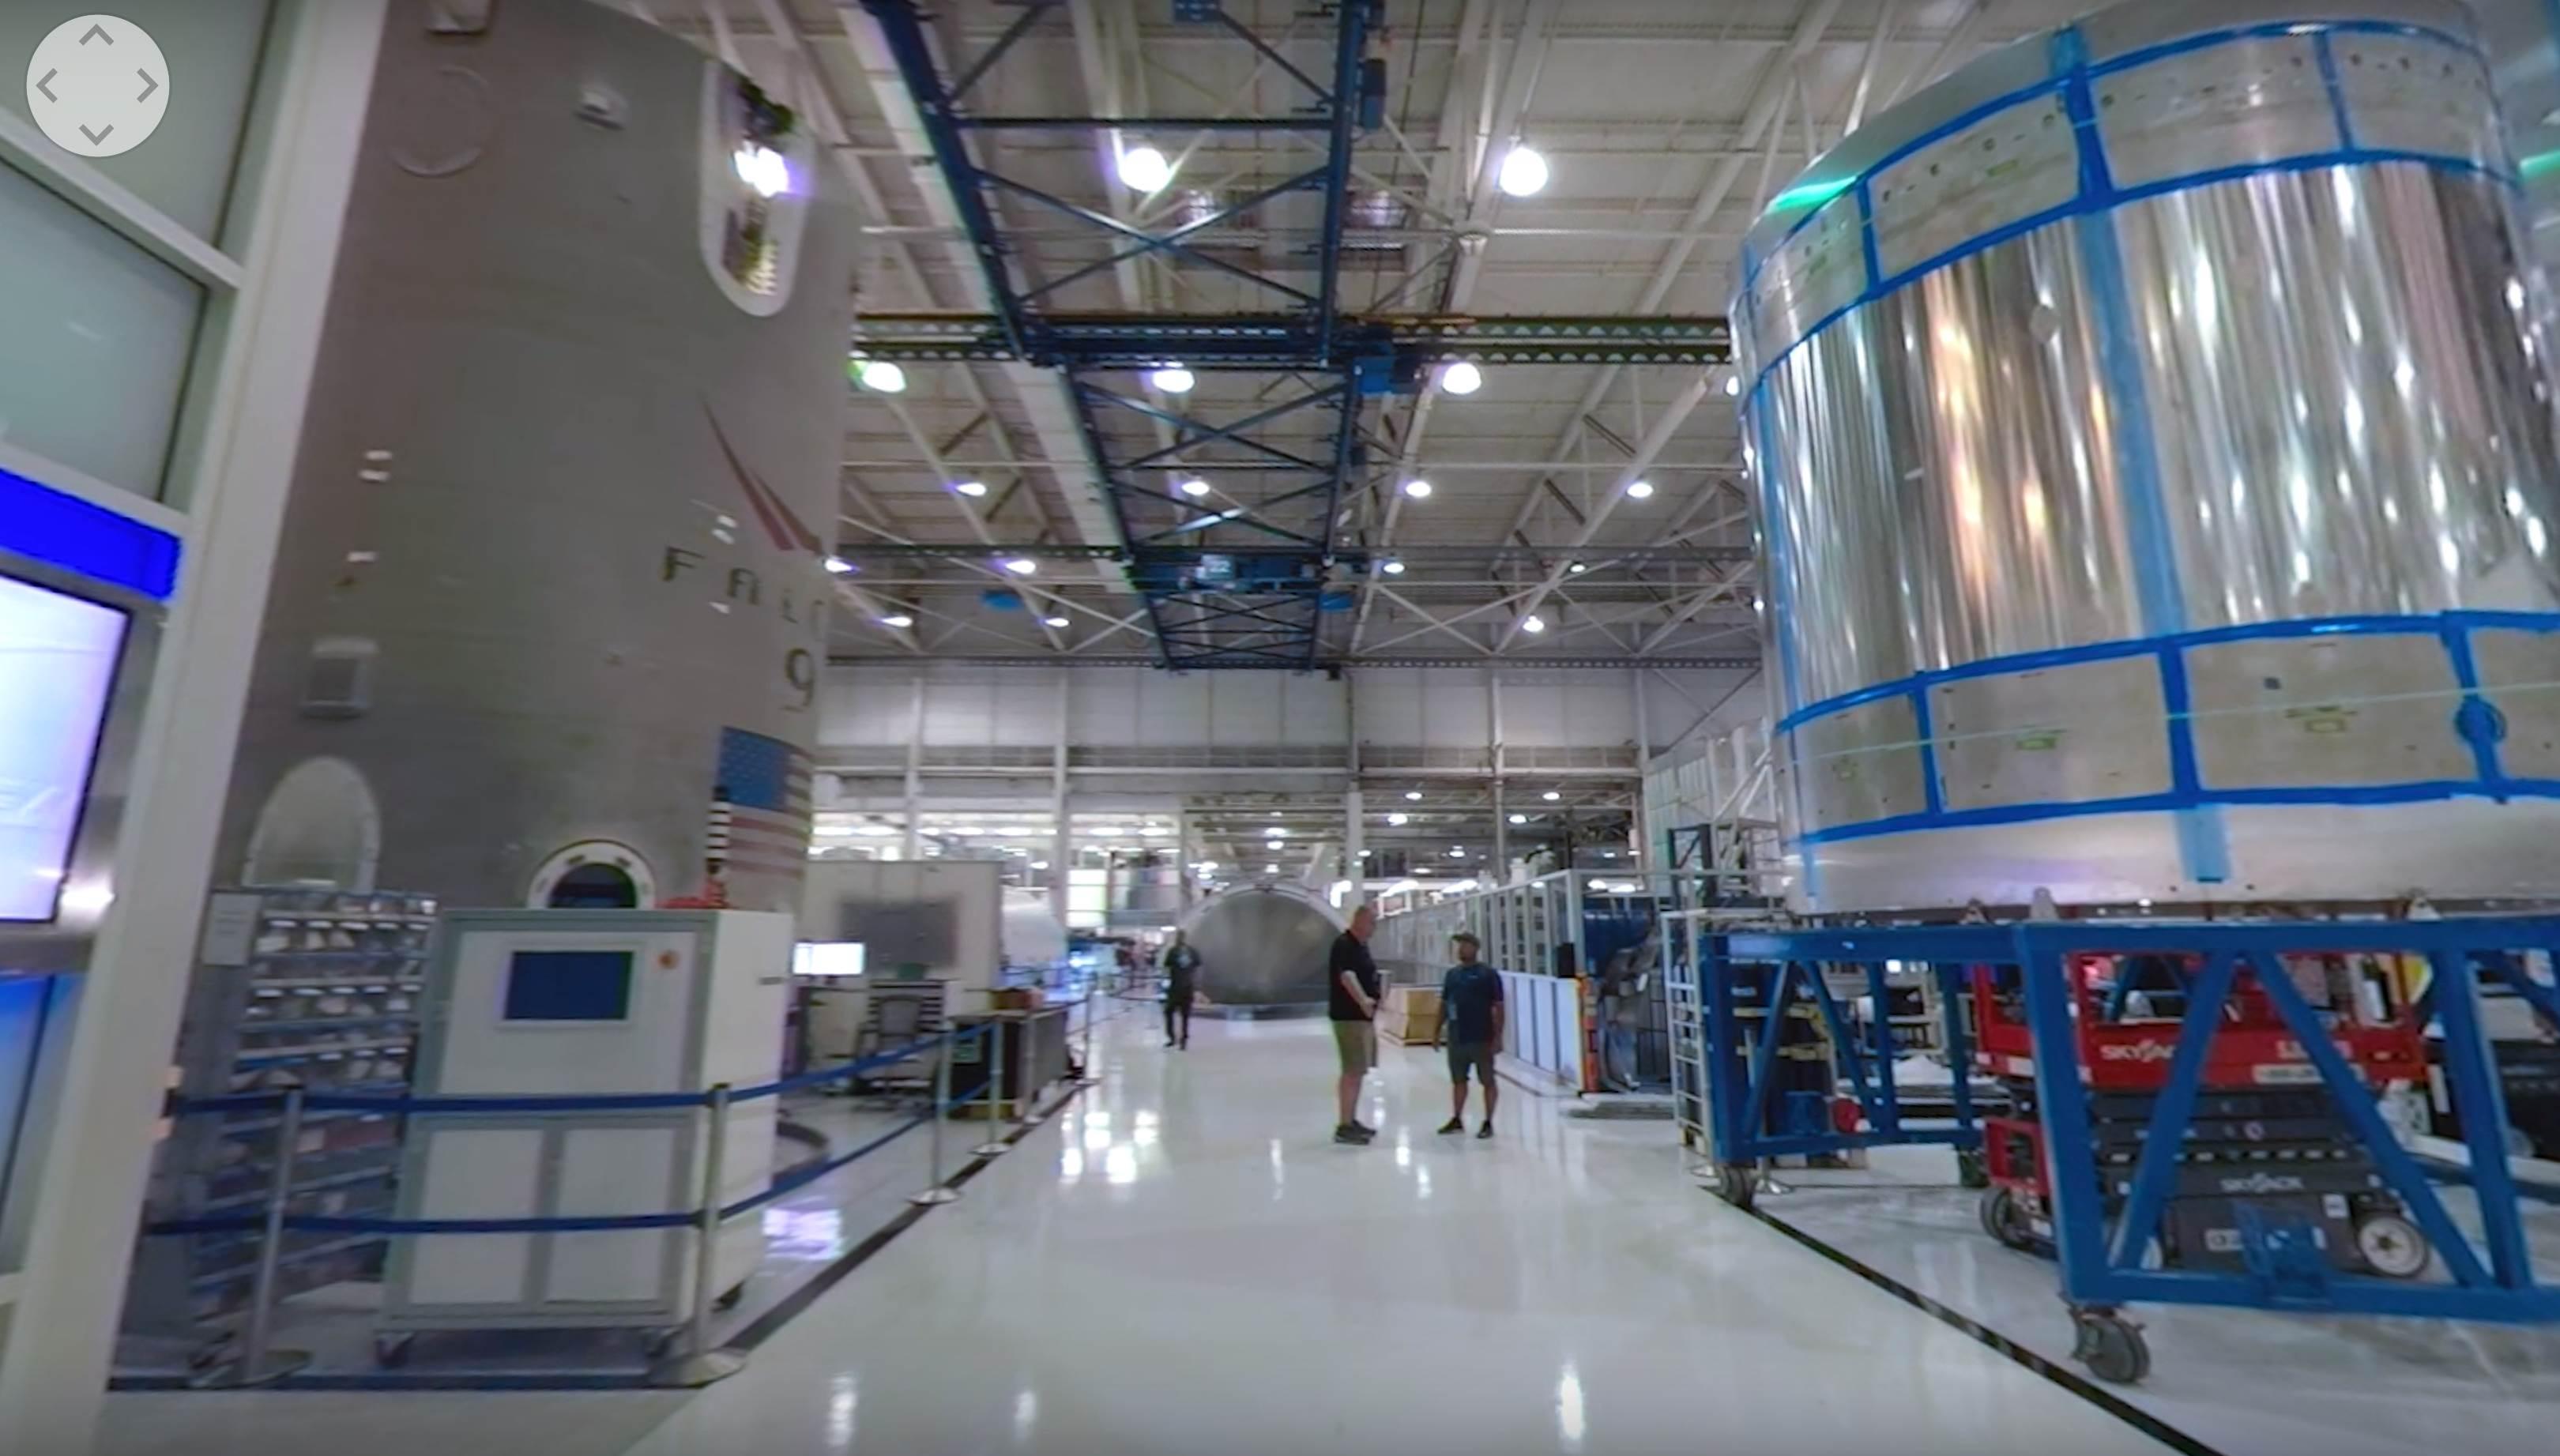 Hawthorne tour 2019 (NASA) Falcon 9 fairing integration 1